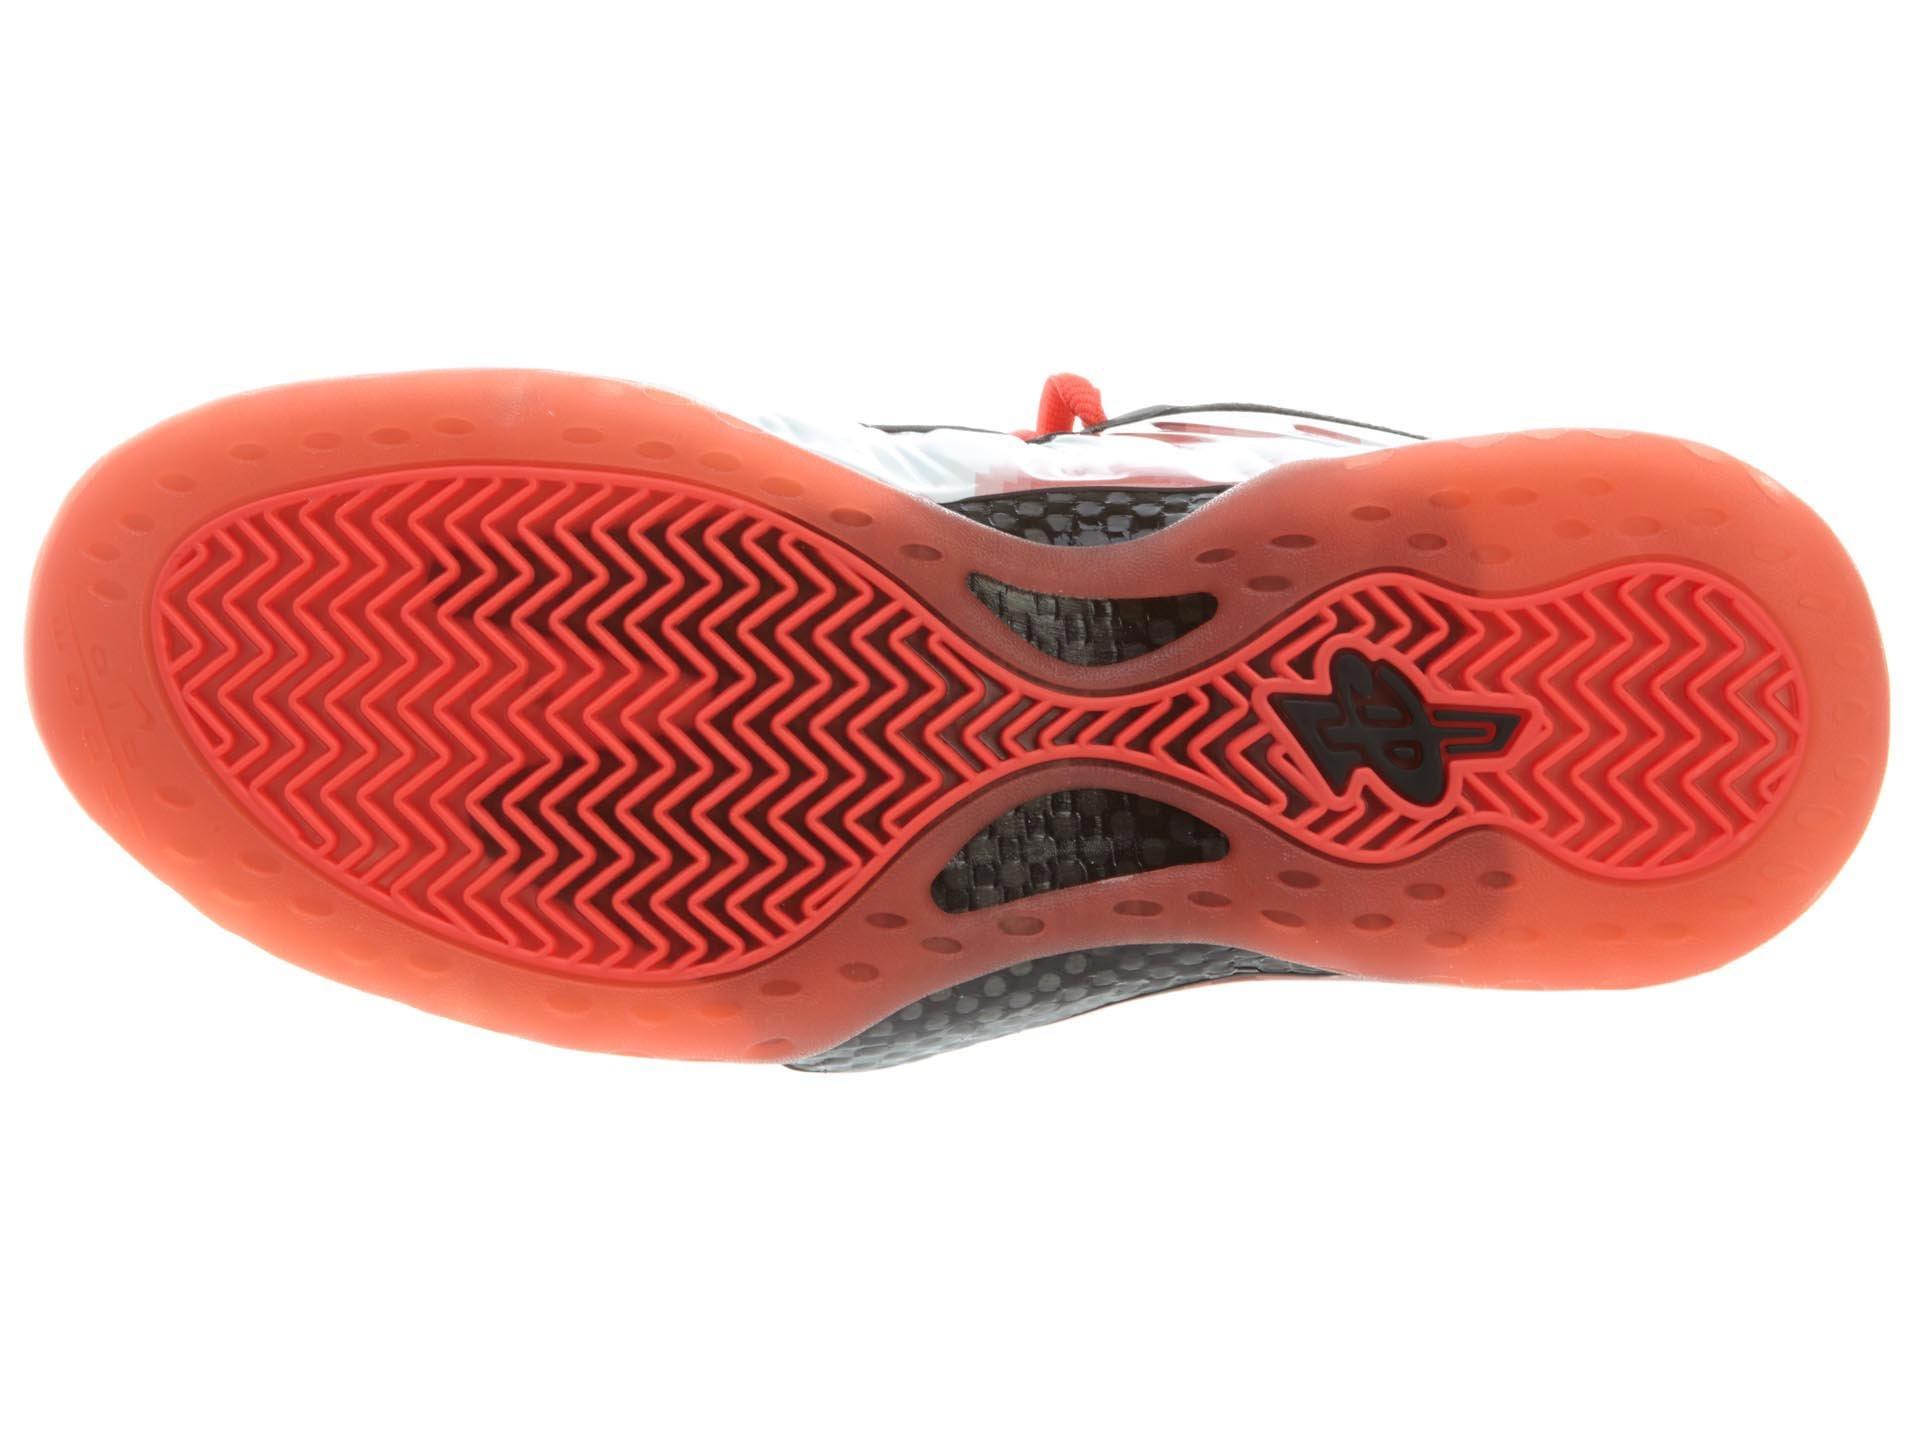 Nike 314996008 Air Foamposite One Retro ... Pinterest